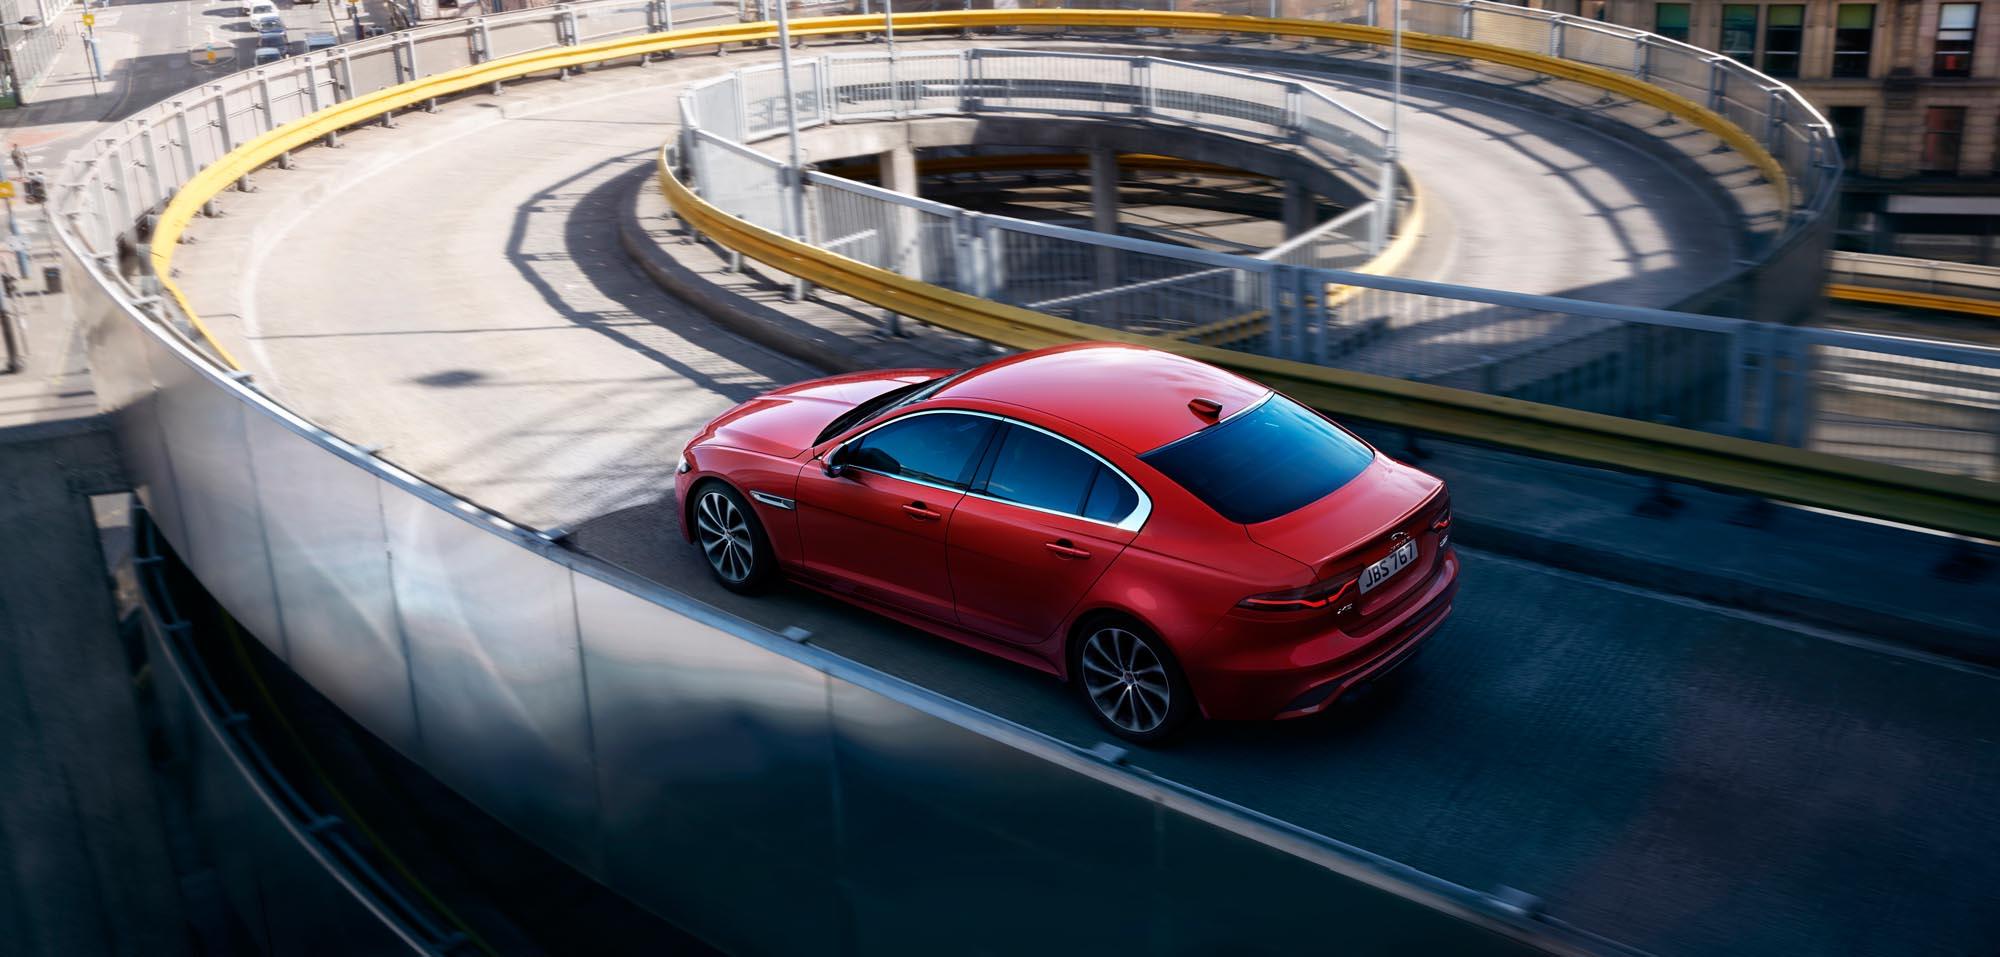 Jaguar XE Stills Production by Luke Jackson